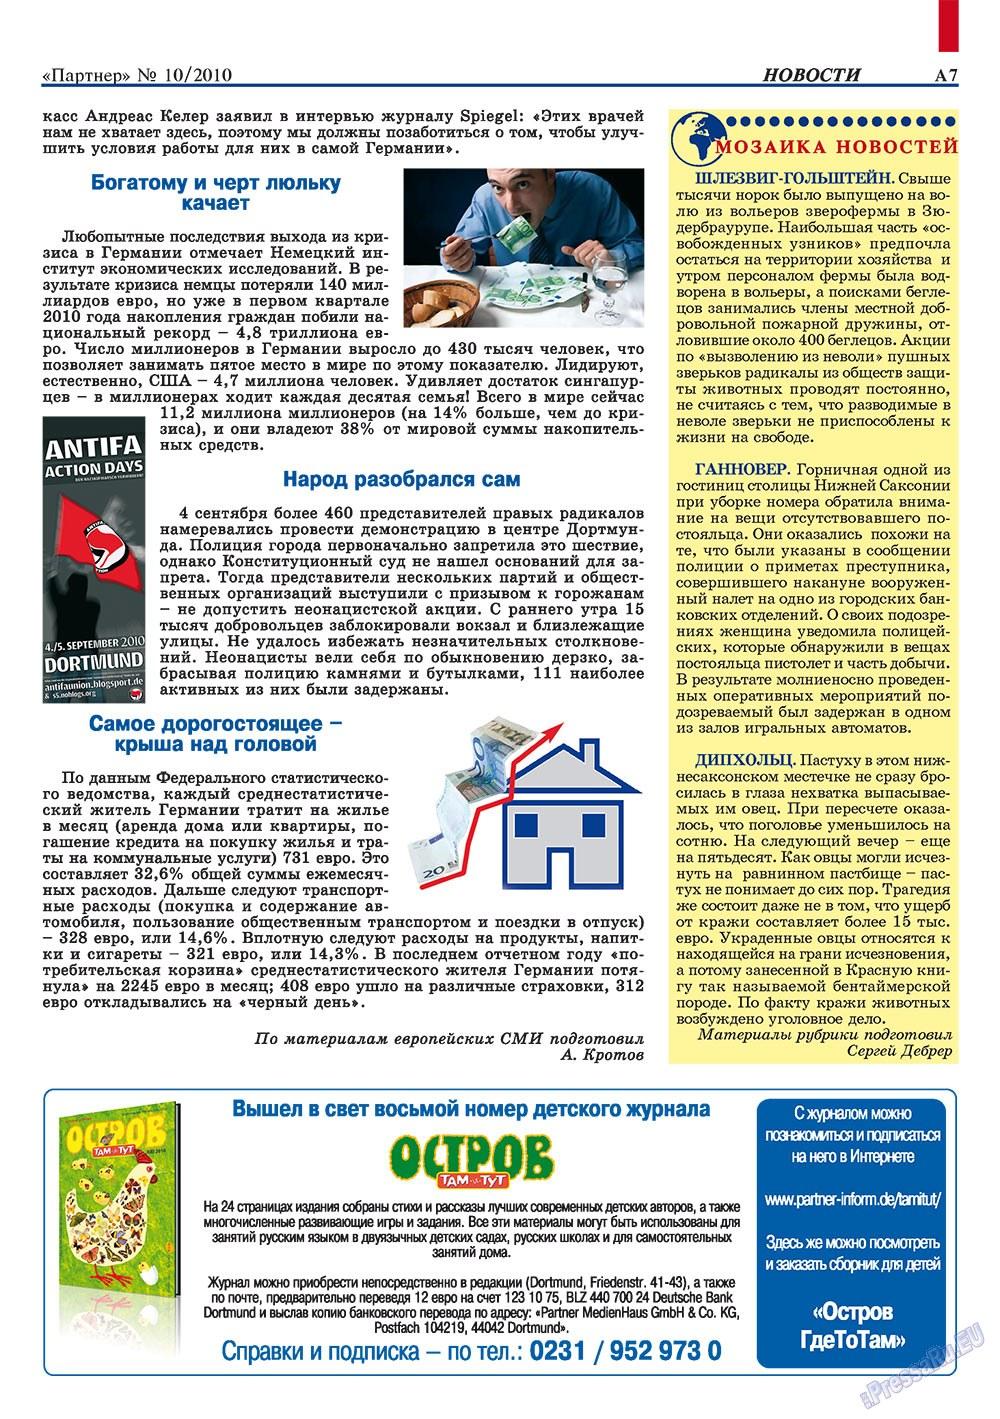 Партнер-север (журнал). 2010 год, номер 10, стр. 7